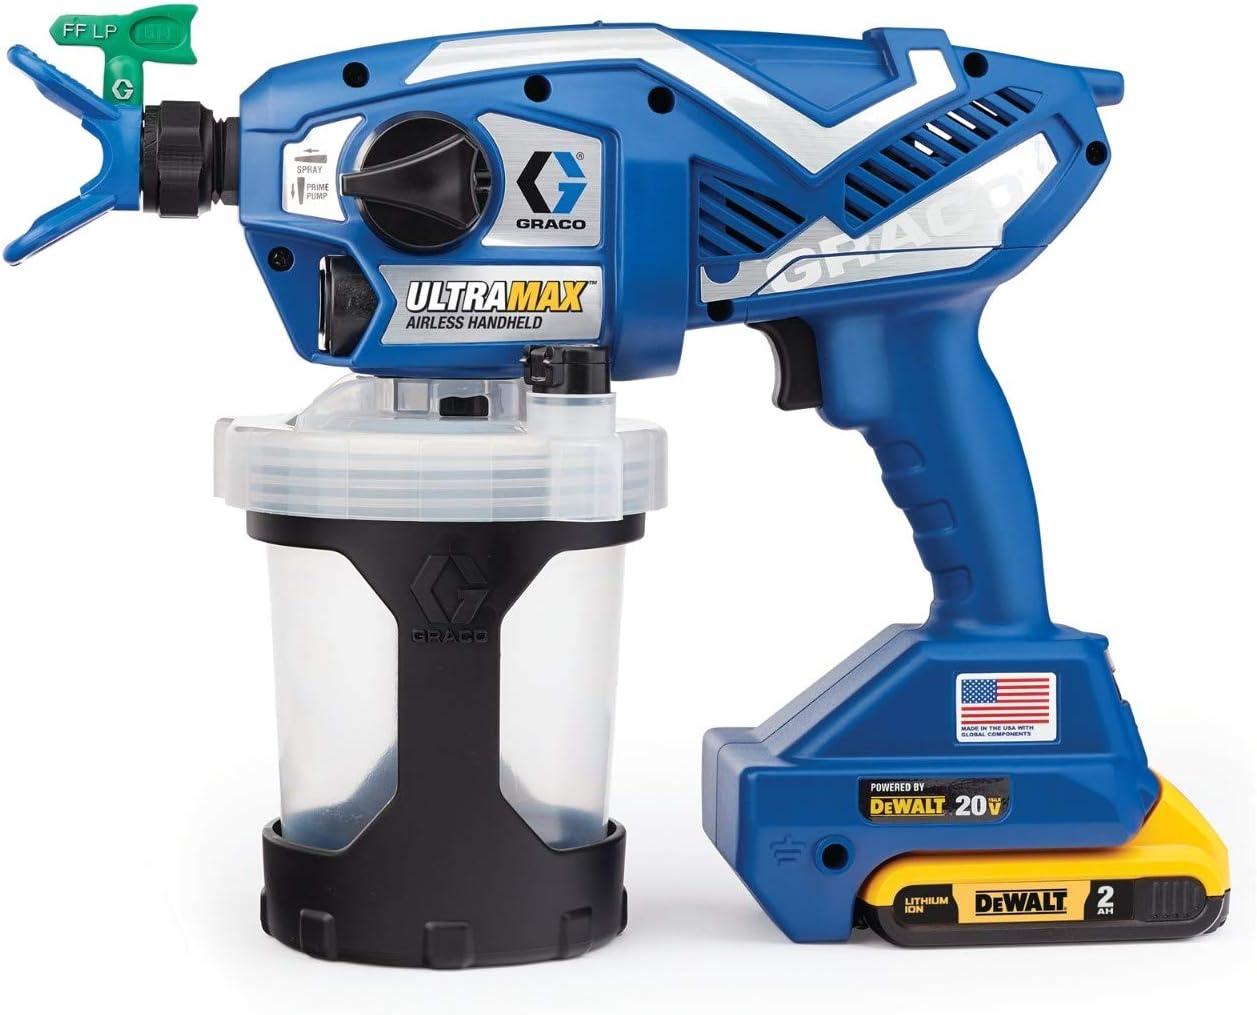 Graco Ultra Max Cordless Airless Handheld Paint Sprayer